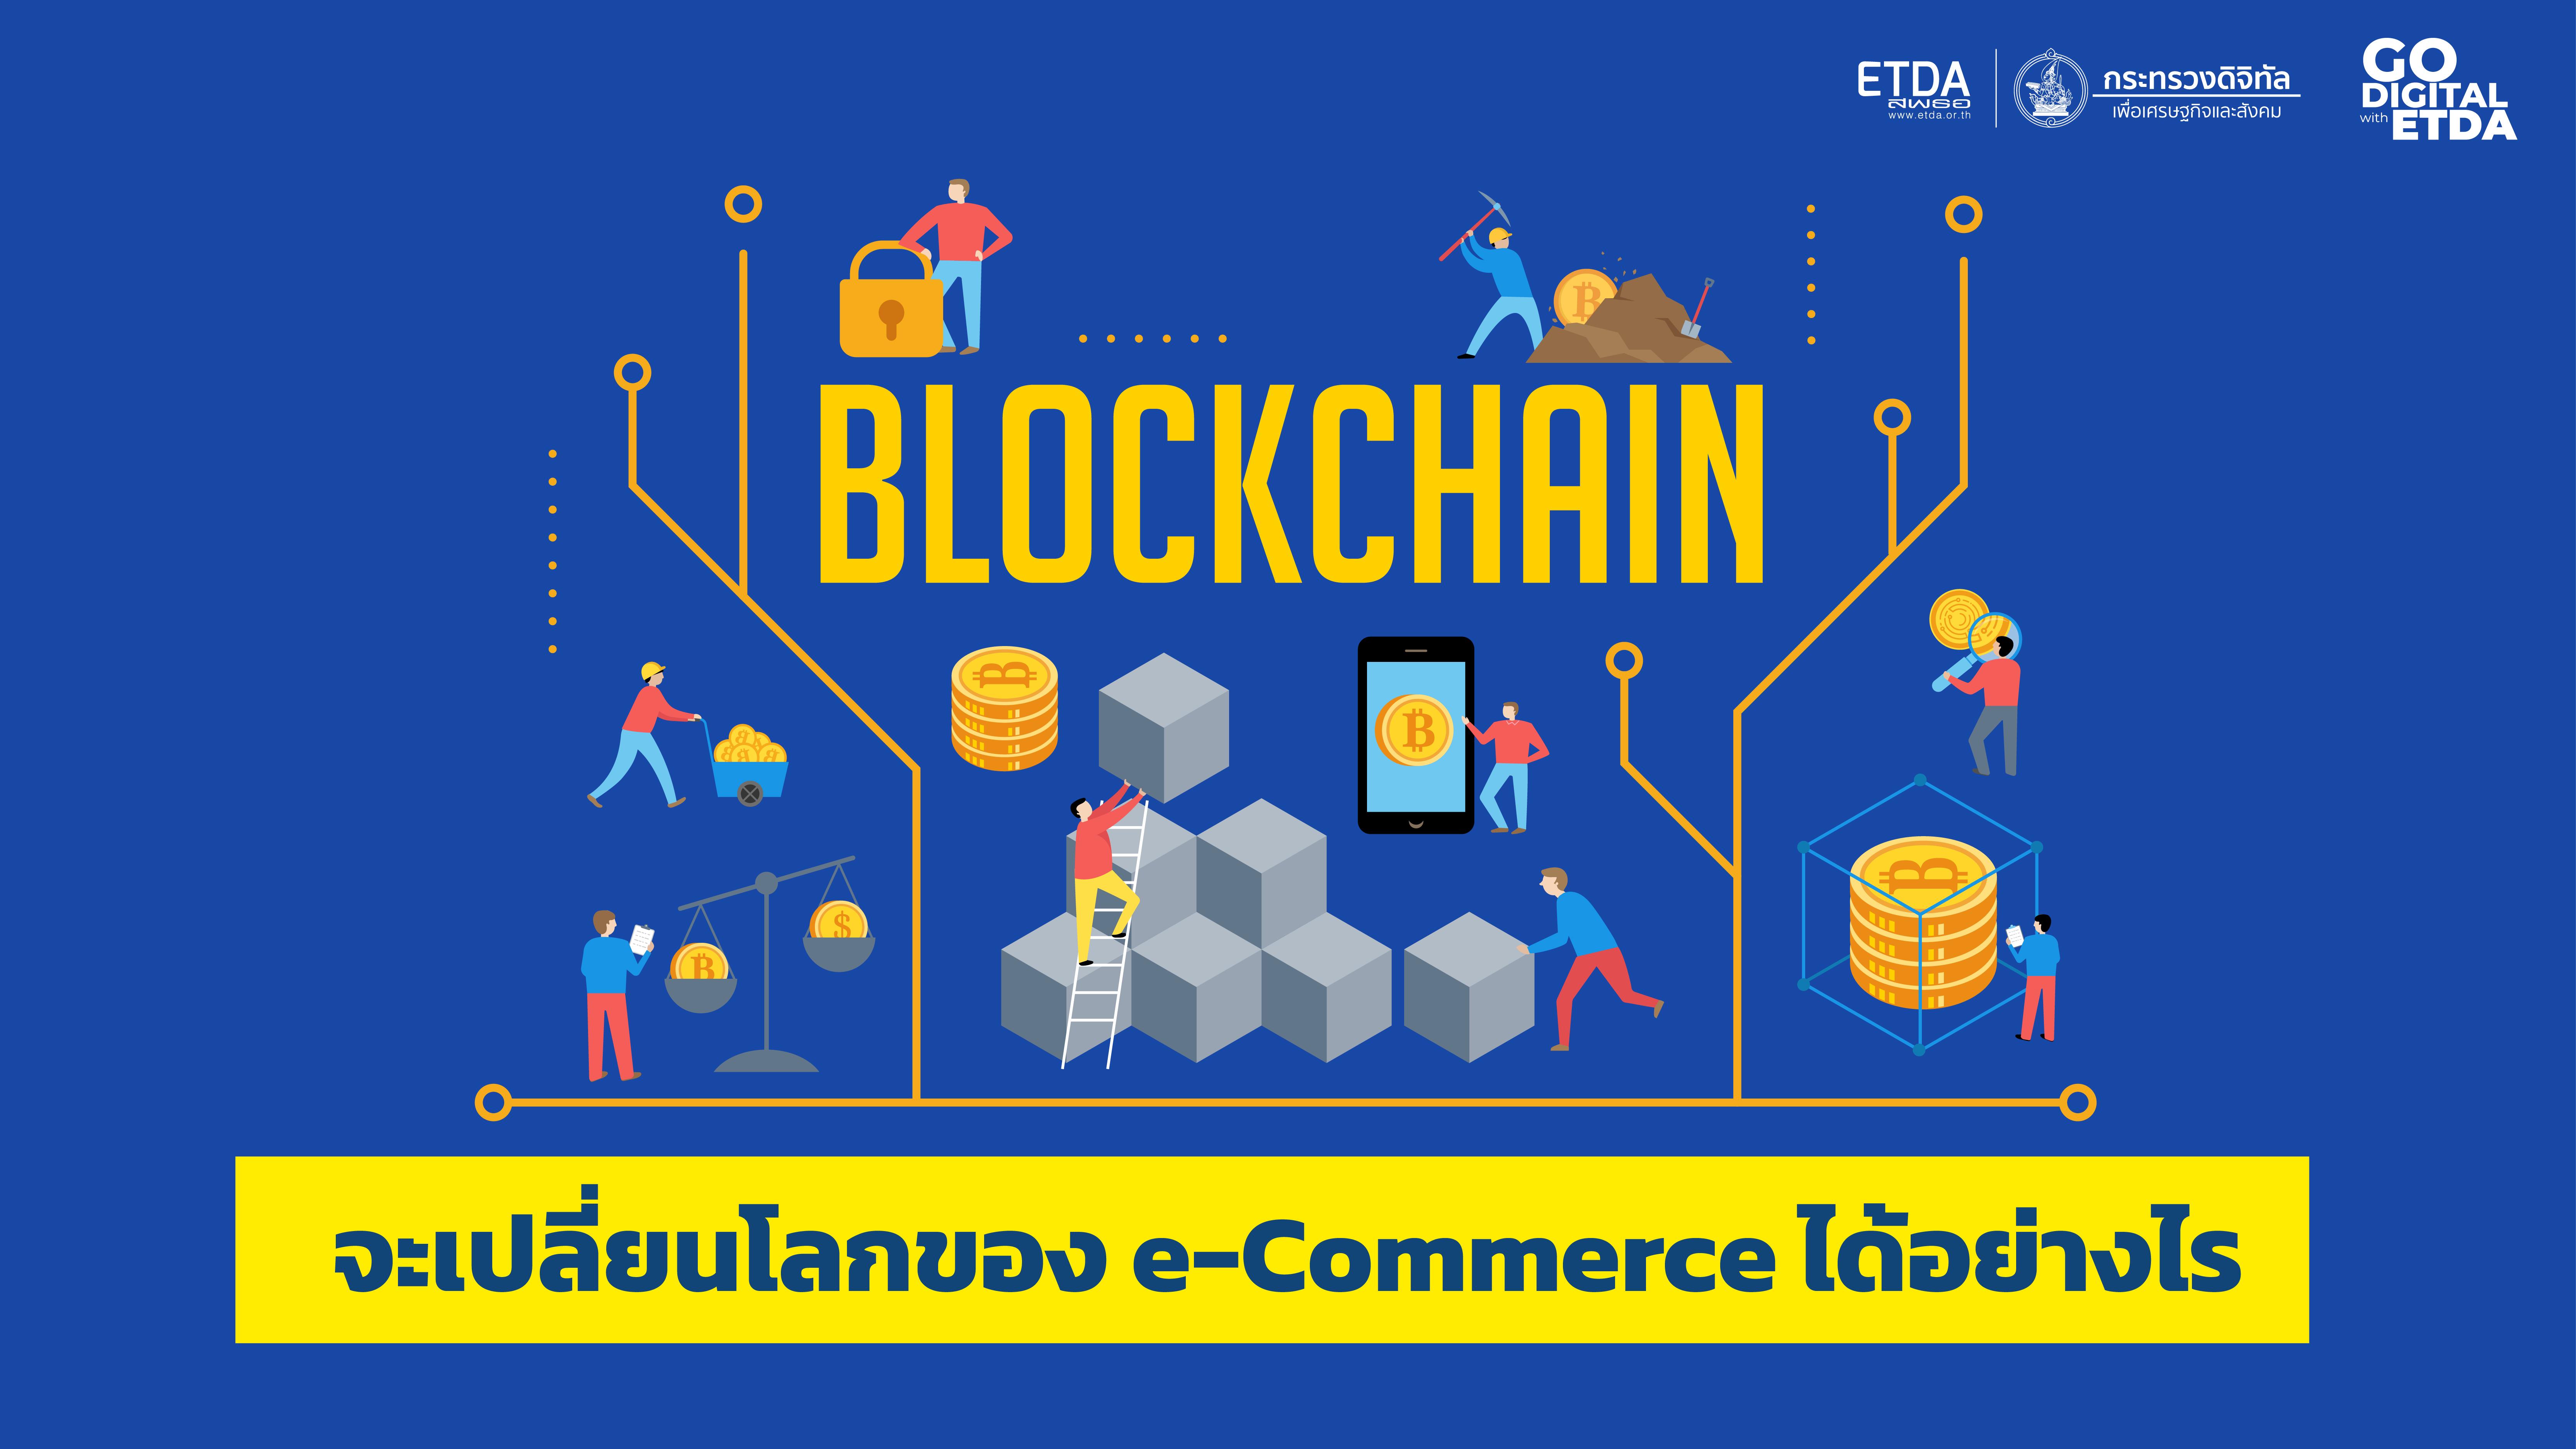 Blockchain จะเปลี่ยนโลกของ e-Commerce ได้อย่างไร